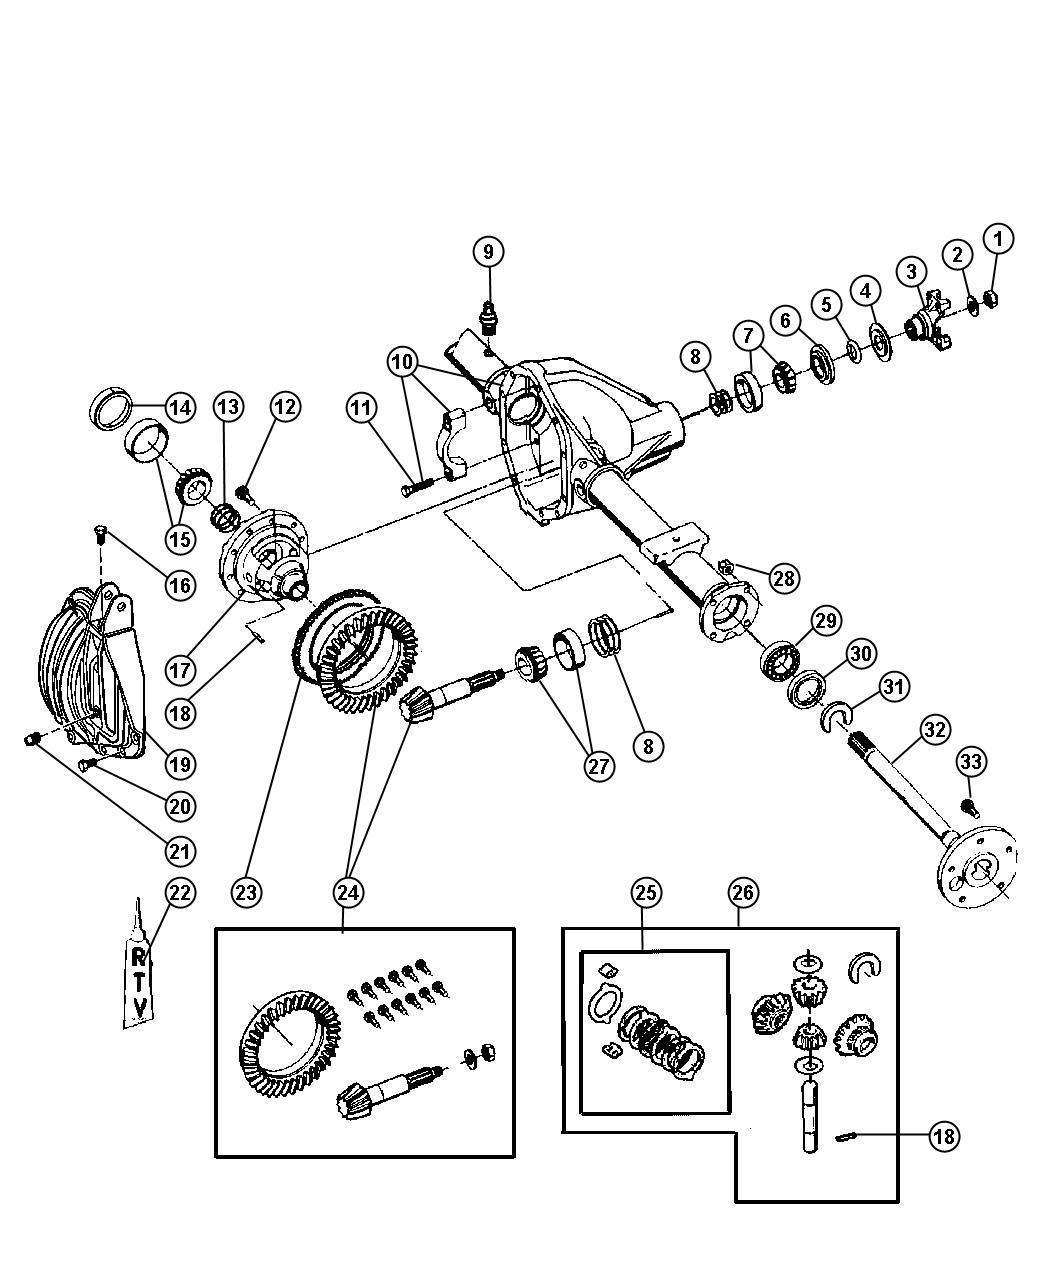 dodge dana 60 front axle parts diagram  dodge  free engine